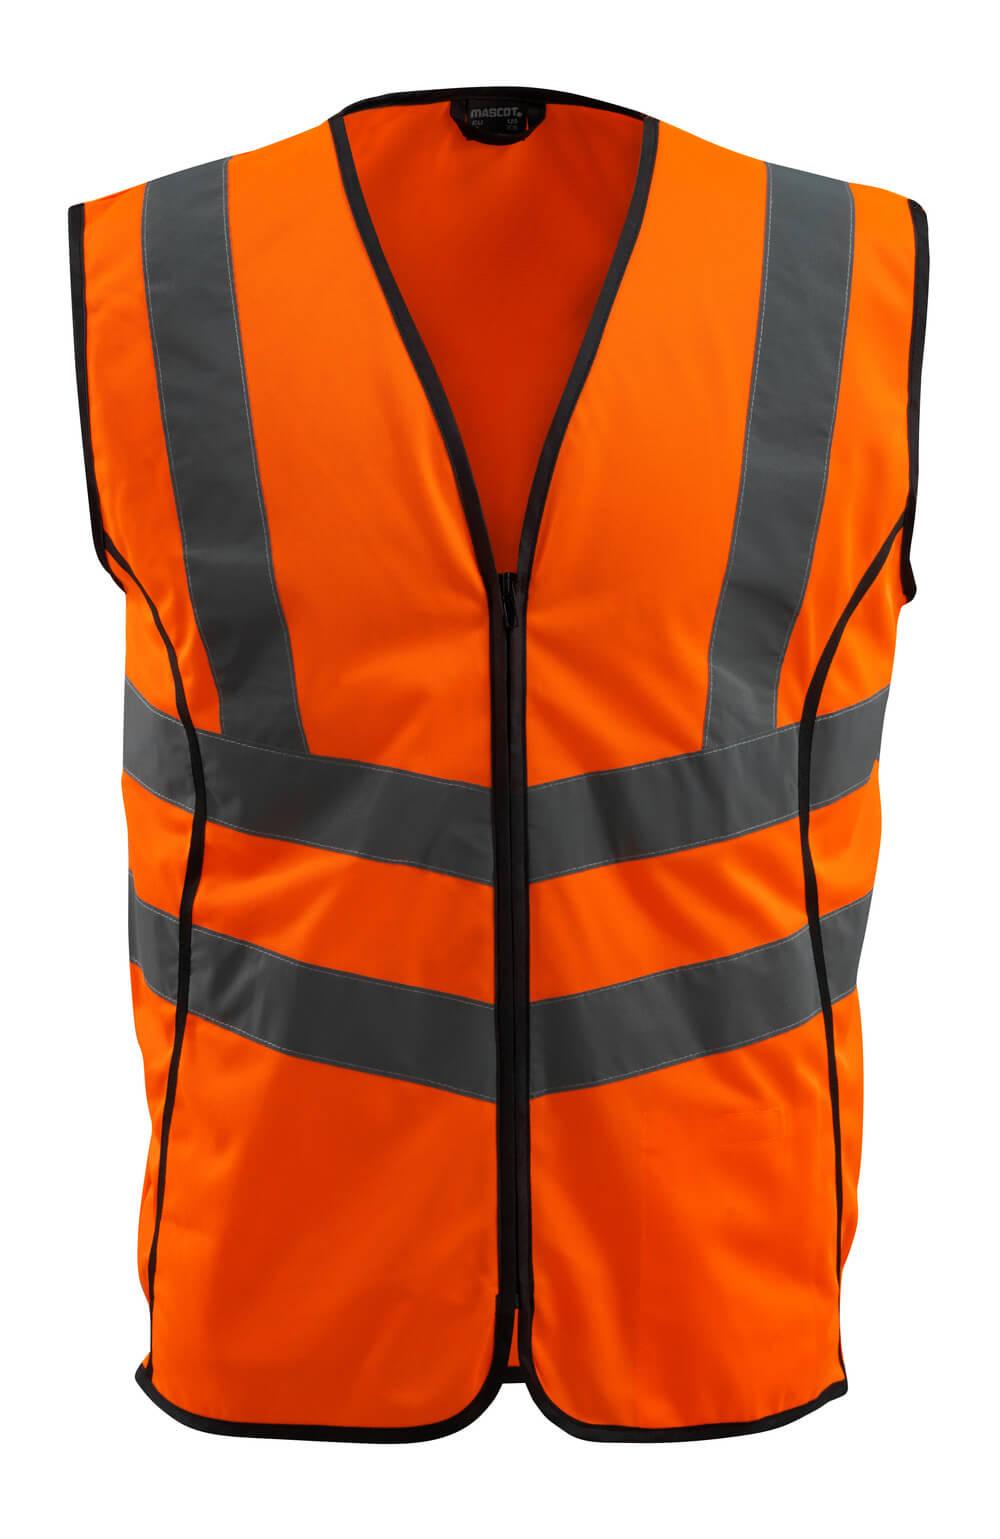 50145-977-14 Chaleco de tráfico - naranja de alta vis.